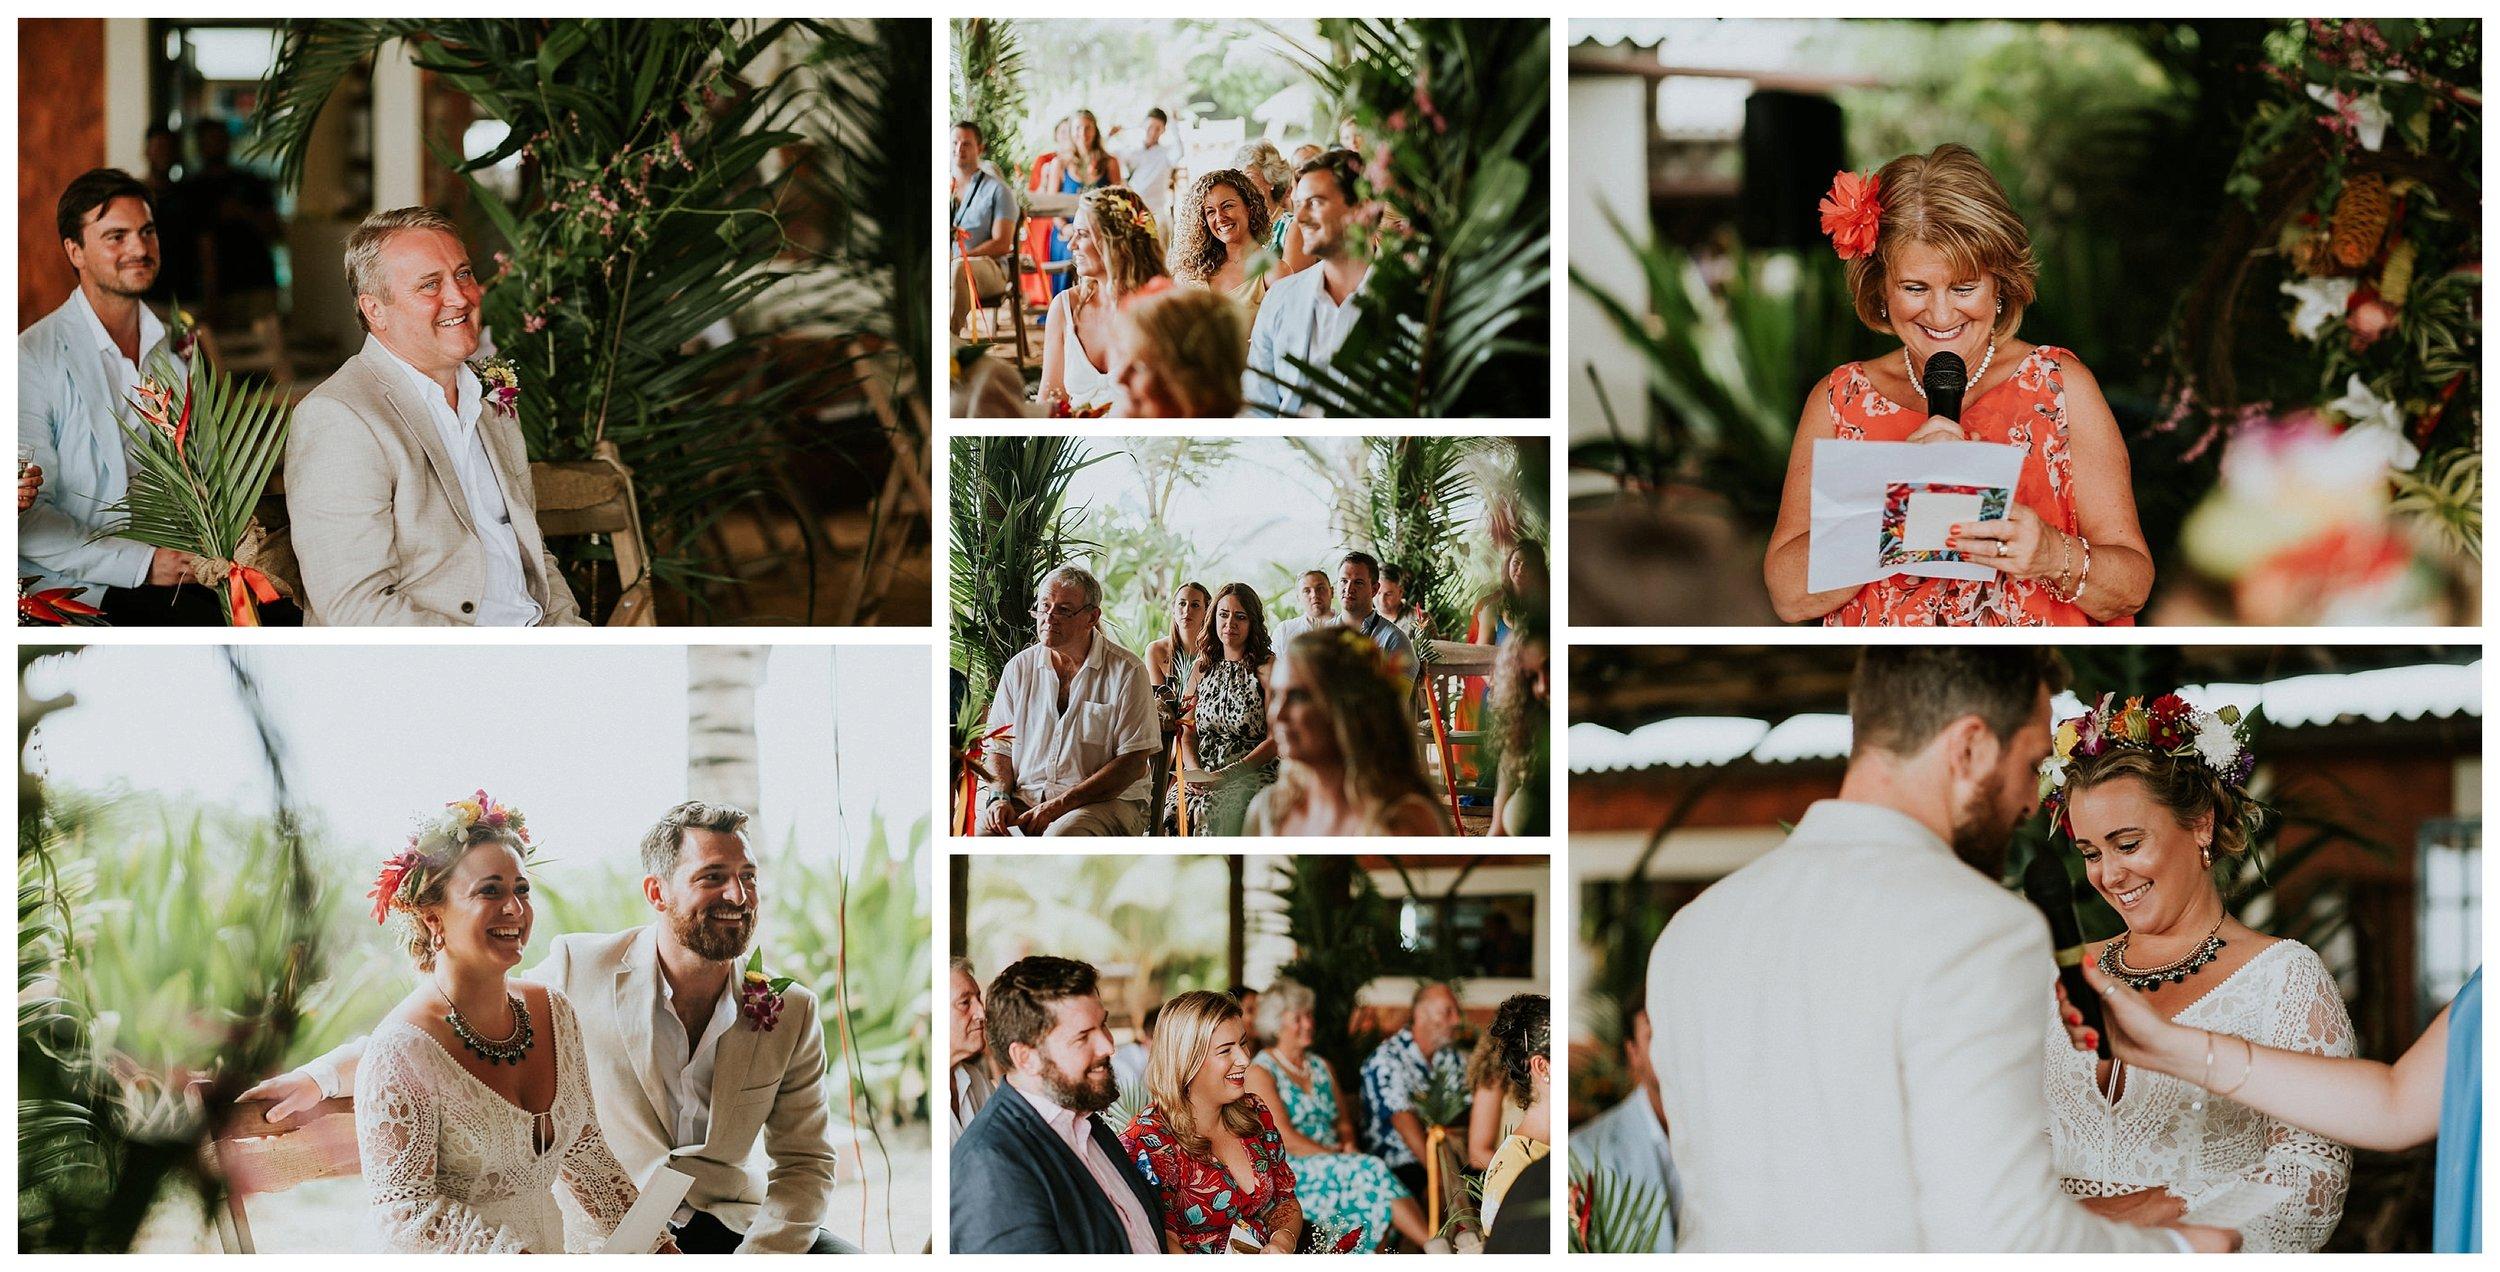 Goa Destination Wedding Photographer India Colouful Fun Joanna Nicole Photography Coco Shambhala11.jpg